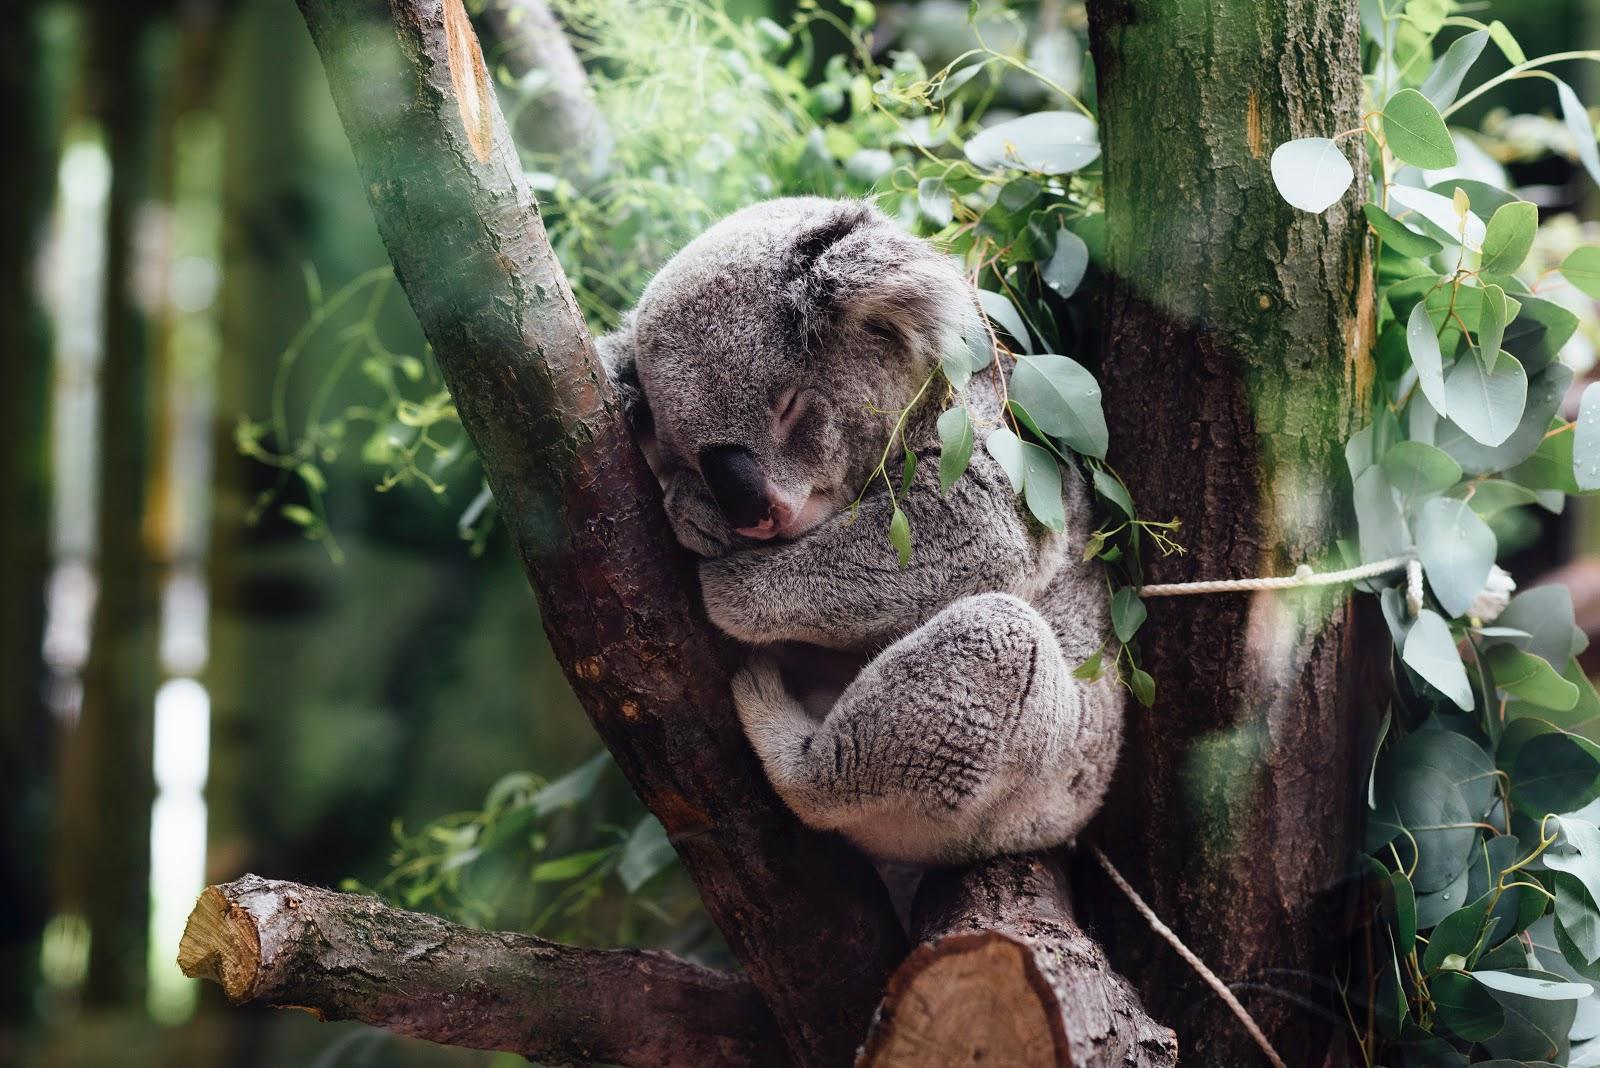 Take a day nap like this Koala, we give you permission.